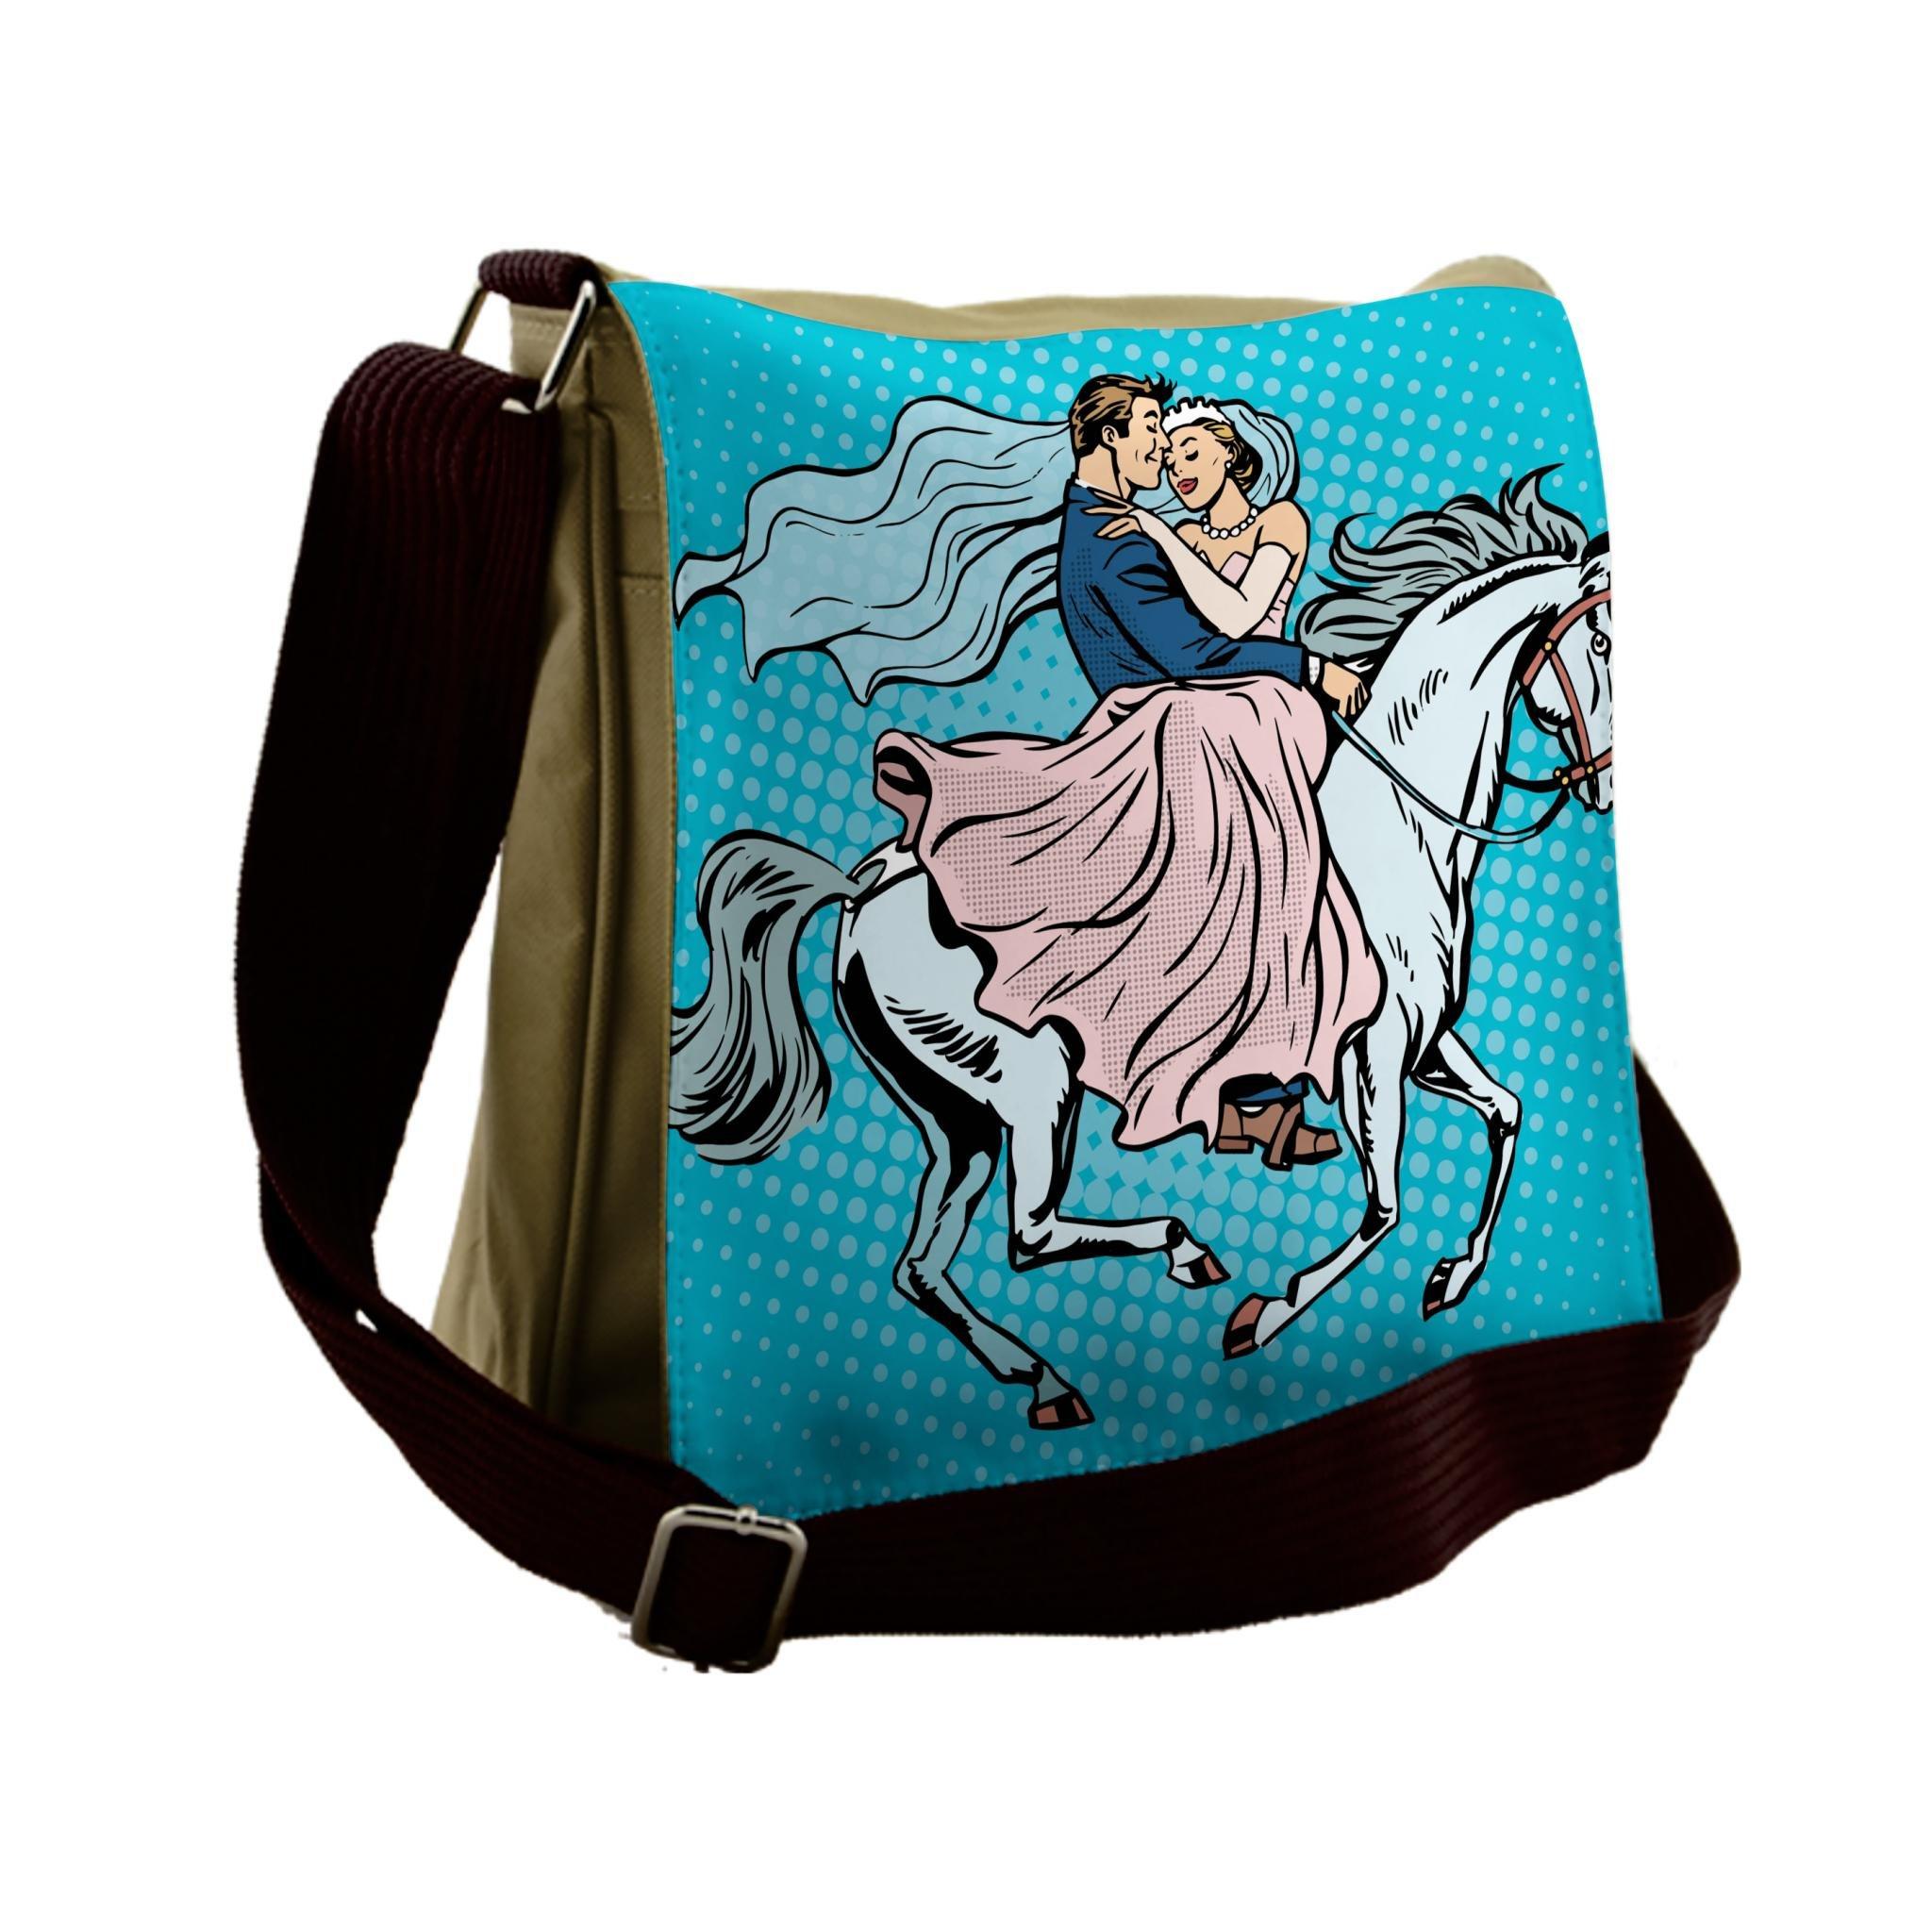 Lunarable Wedding Messenger Bag, Married Couple on Horse, Unisex Cross-body